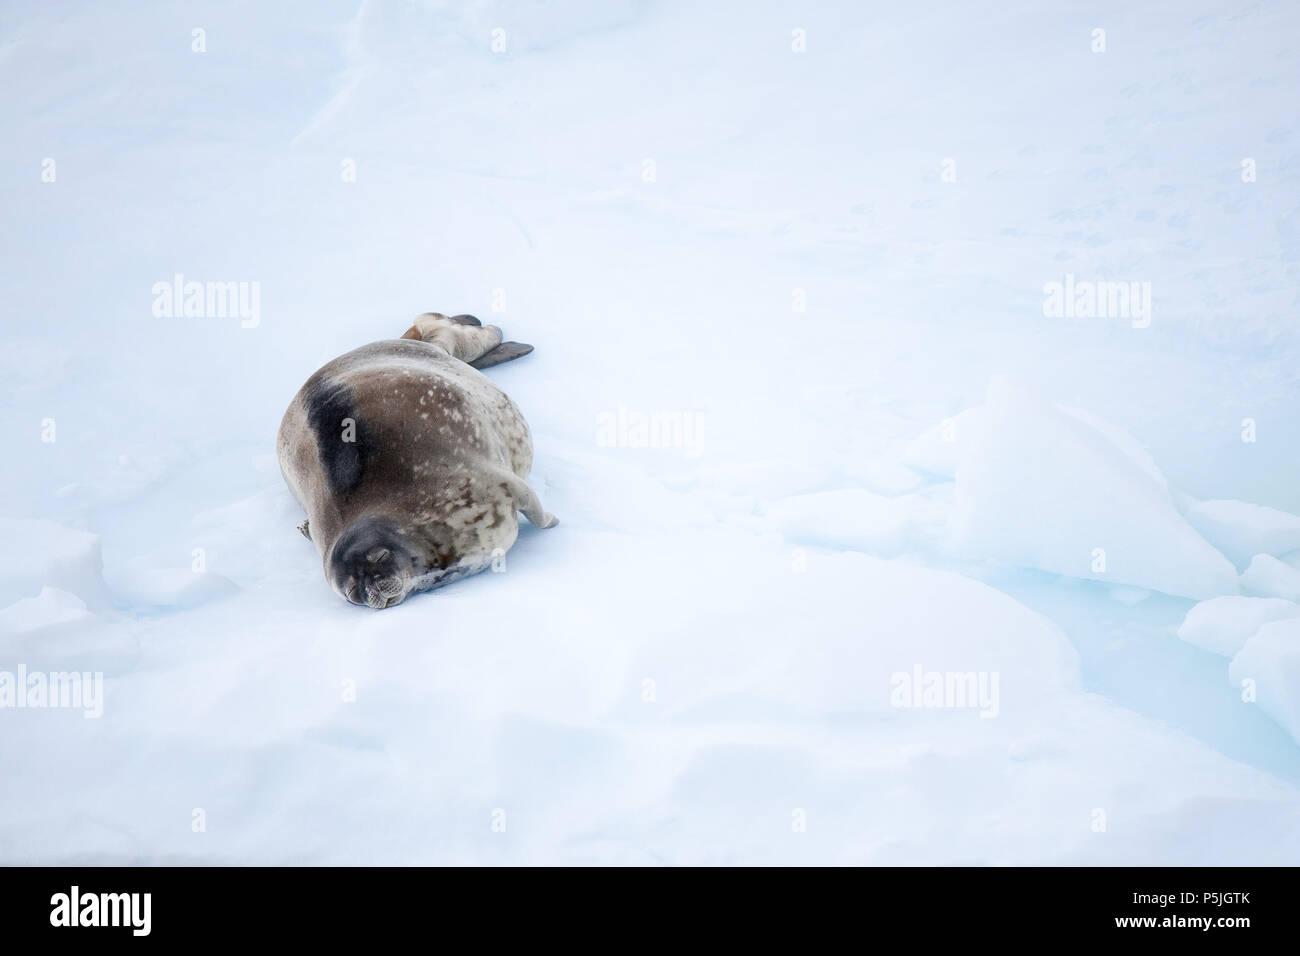 Weddell Seal on an ice floe, Antarctica - Stock Image